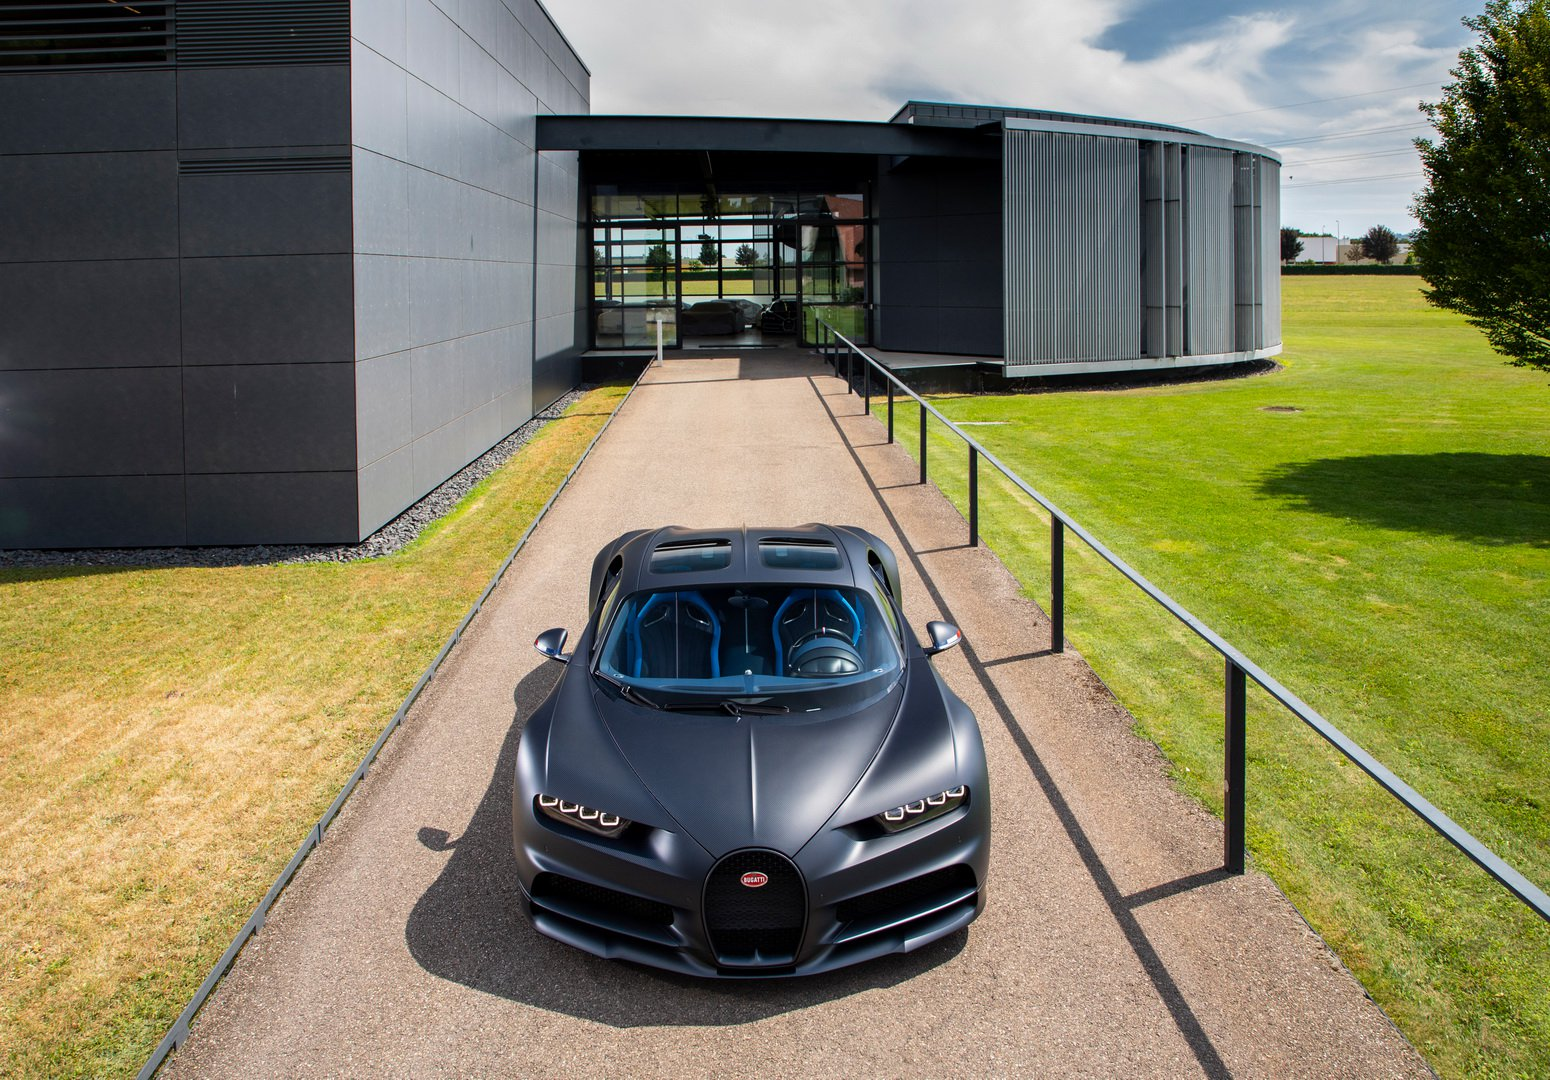 Bugatti-Chiron-Sport-110-Ans-Bugatti-production-plant-39